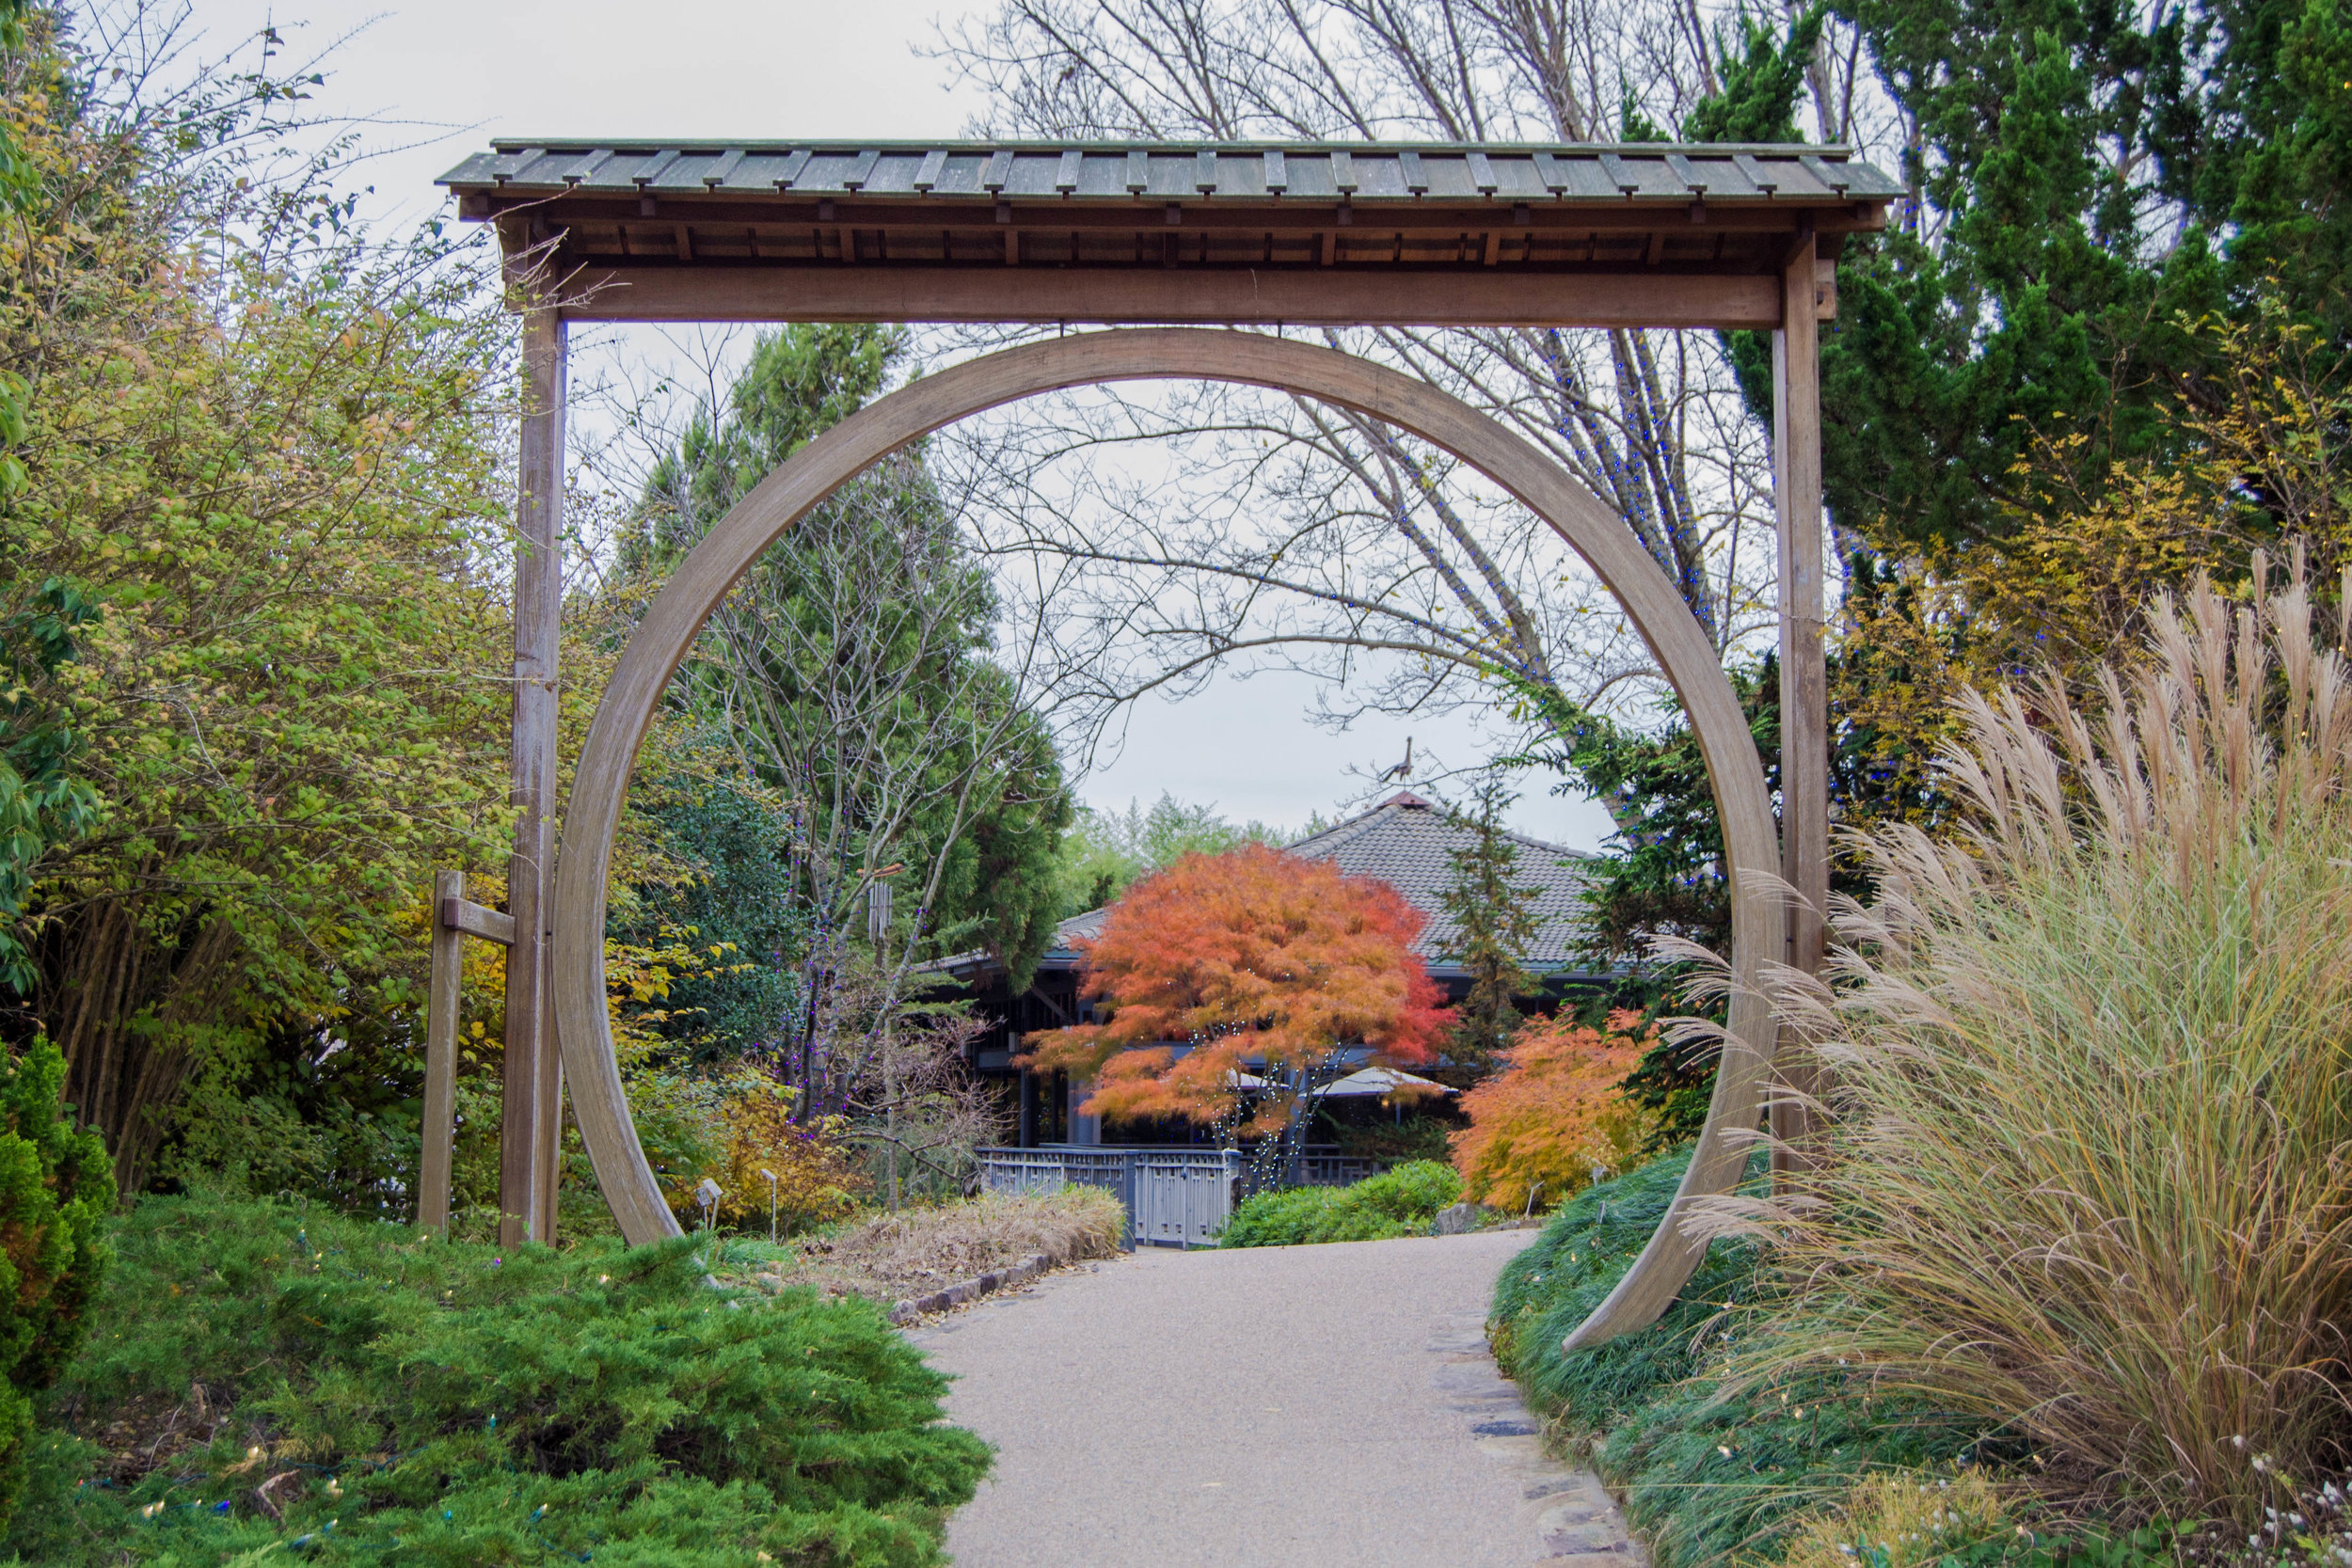 The moon gate entrance to the Robins Tea House